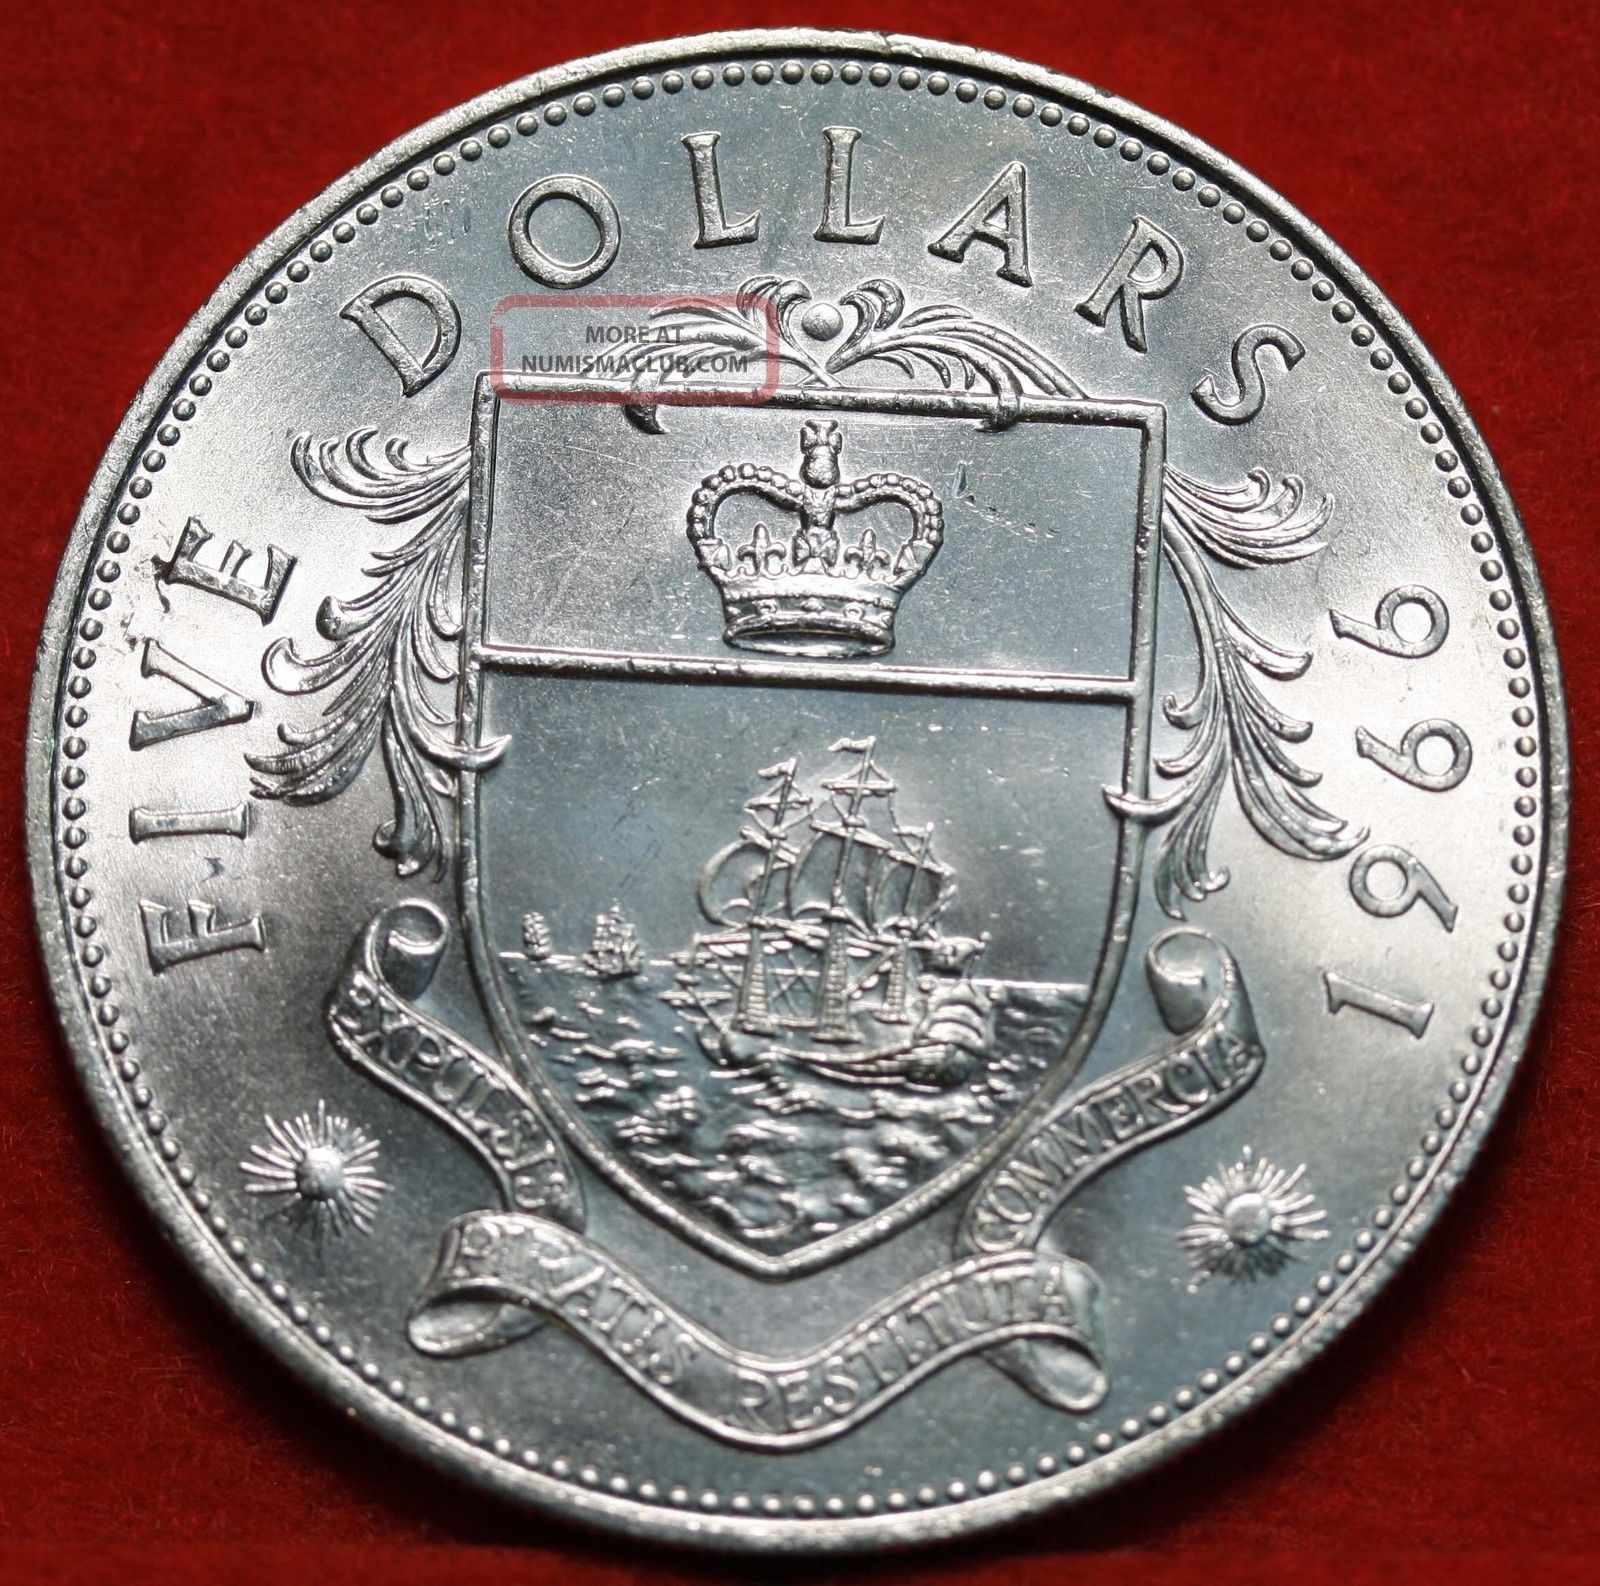 bahamas coins silver